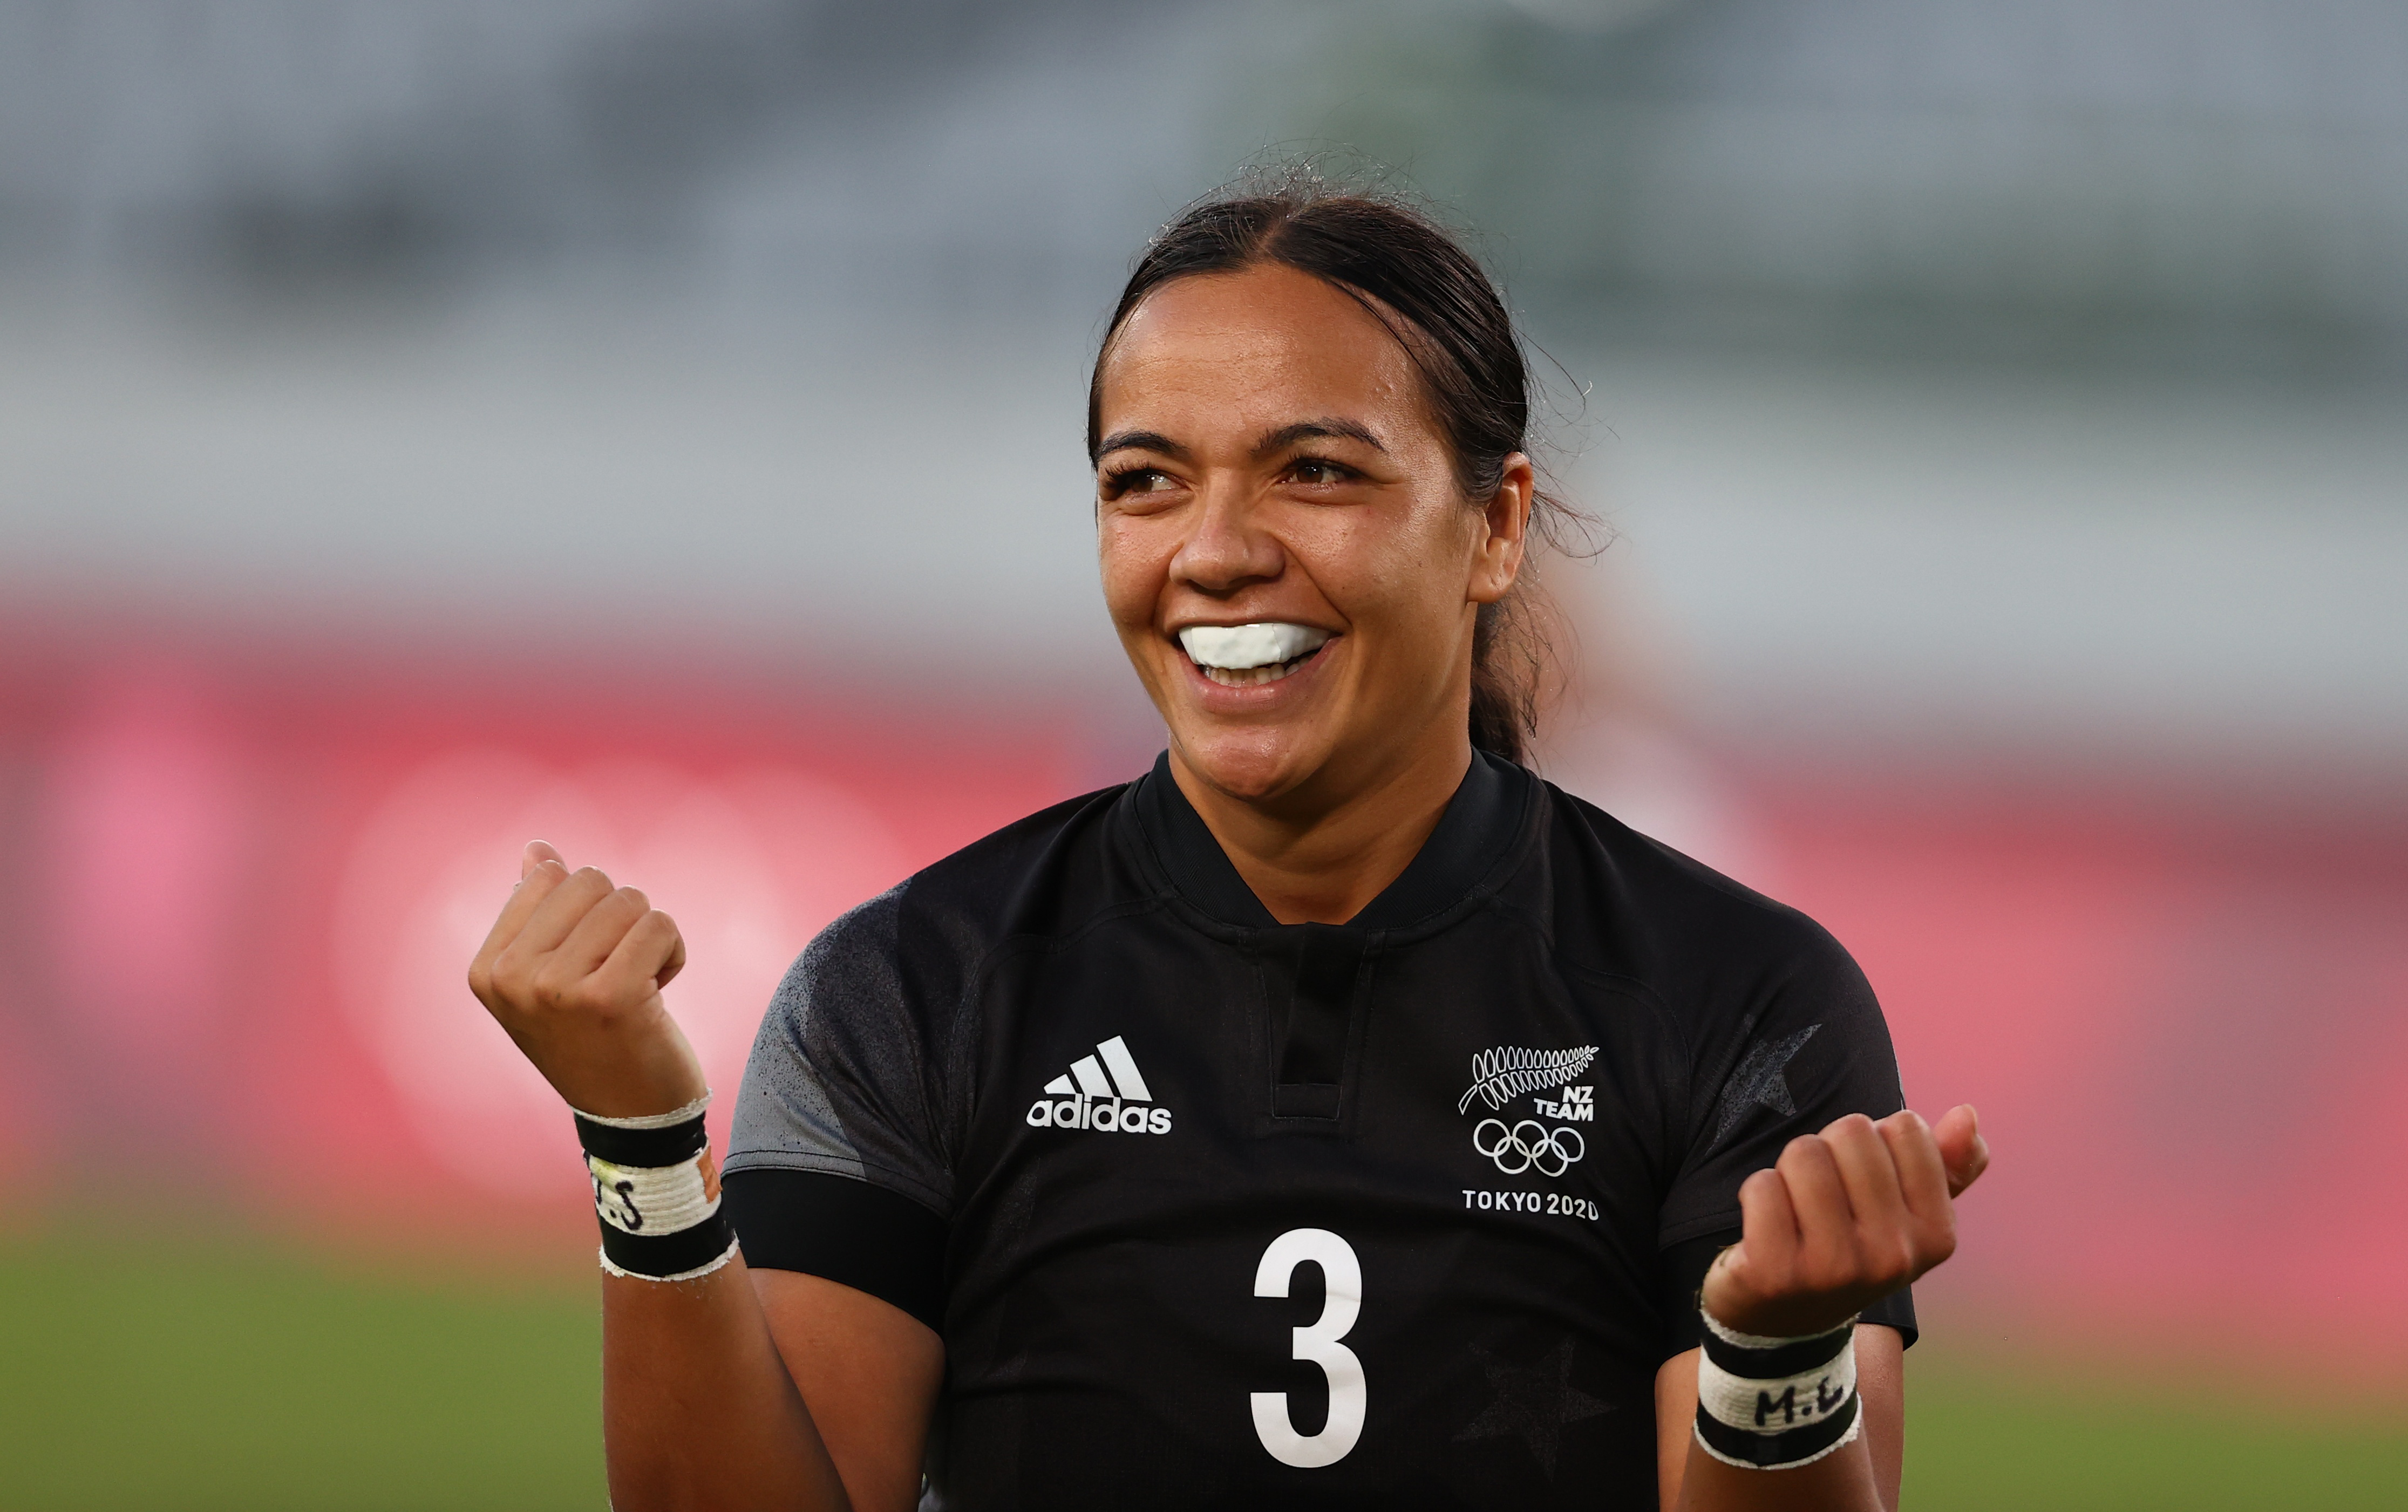 Tokyo 2020 Olympics - Rugby Sevens - Women - Gold medal match - New Zealand v France - Tokyo Stadium - Tokyo, Japan - July 31, 2021. Stacey Fluhler of New Zealand. REUTERS/Siphiwe Sibeko